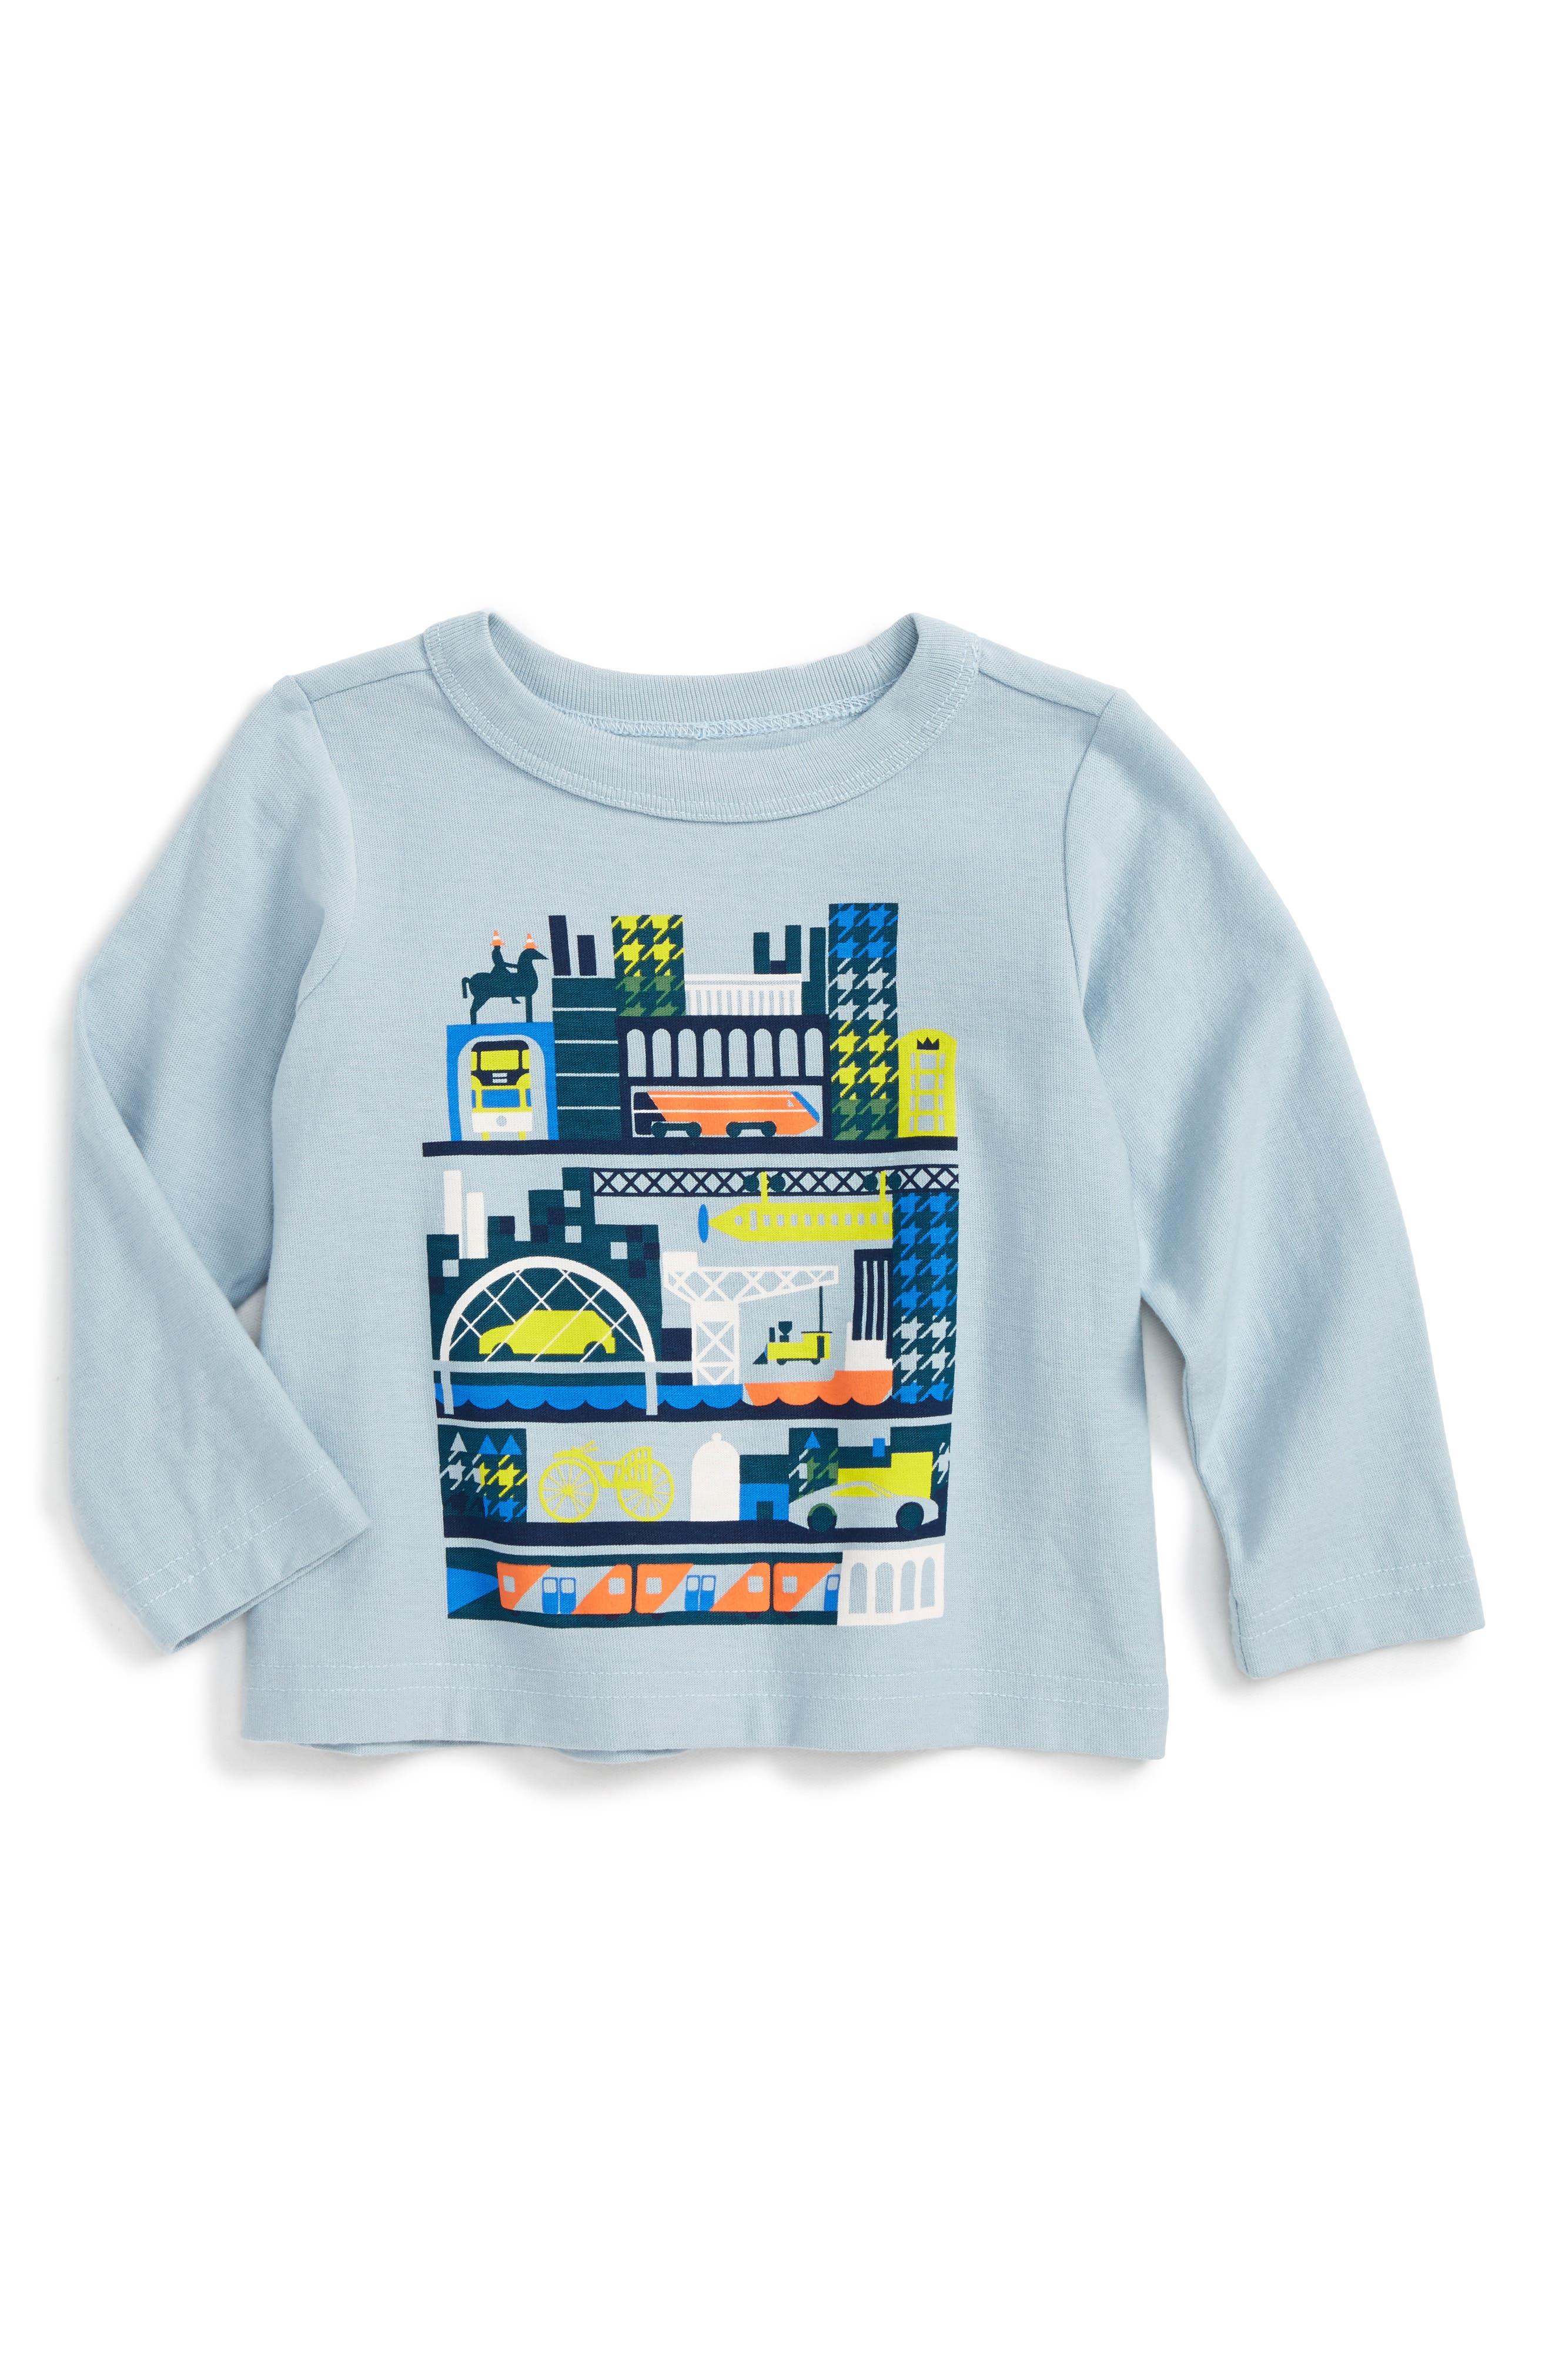 Tea Collection Glasgow Tour Graphic T-Shirt (Baby Boys)